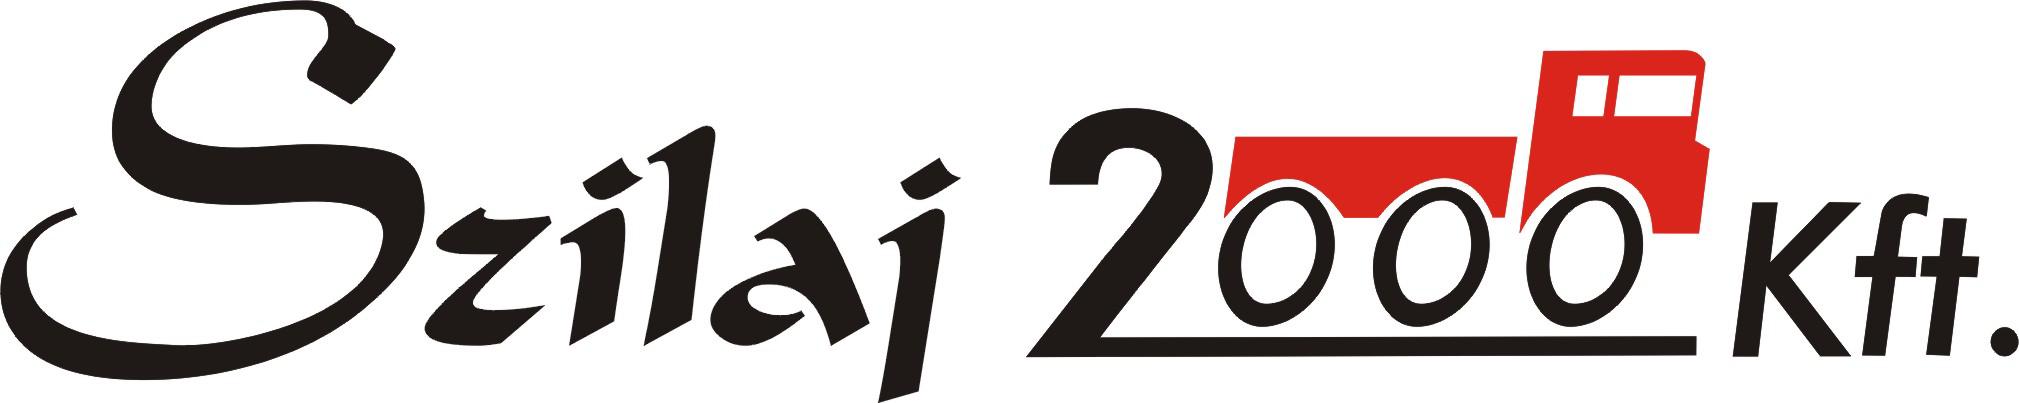 Szilaj2000